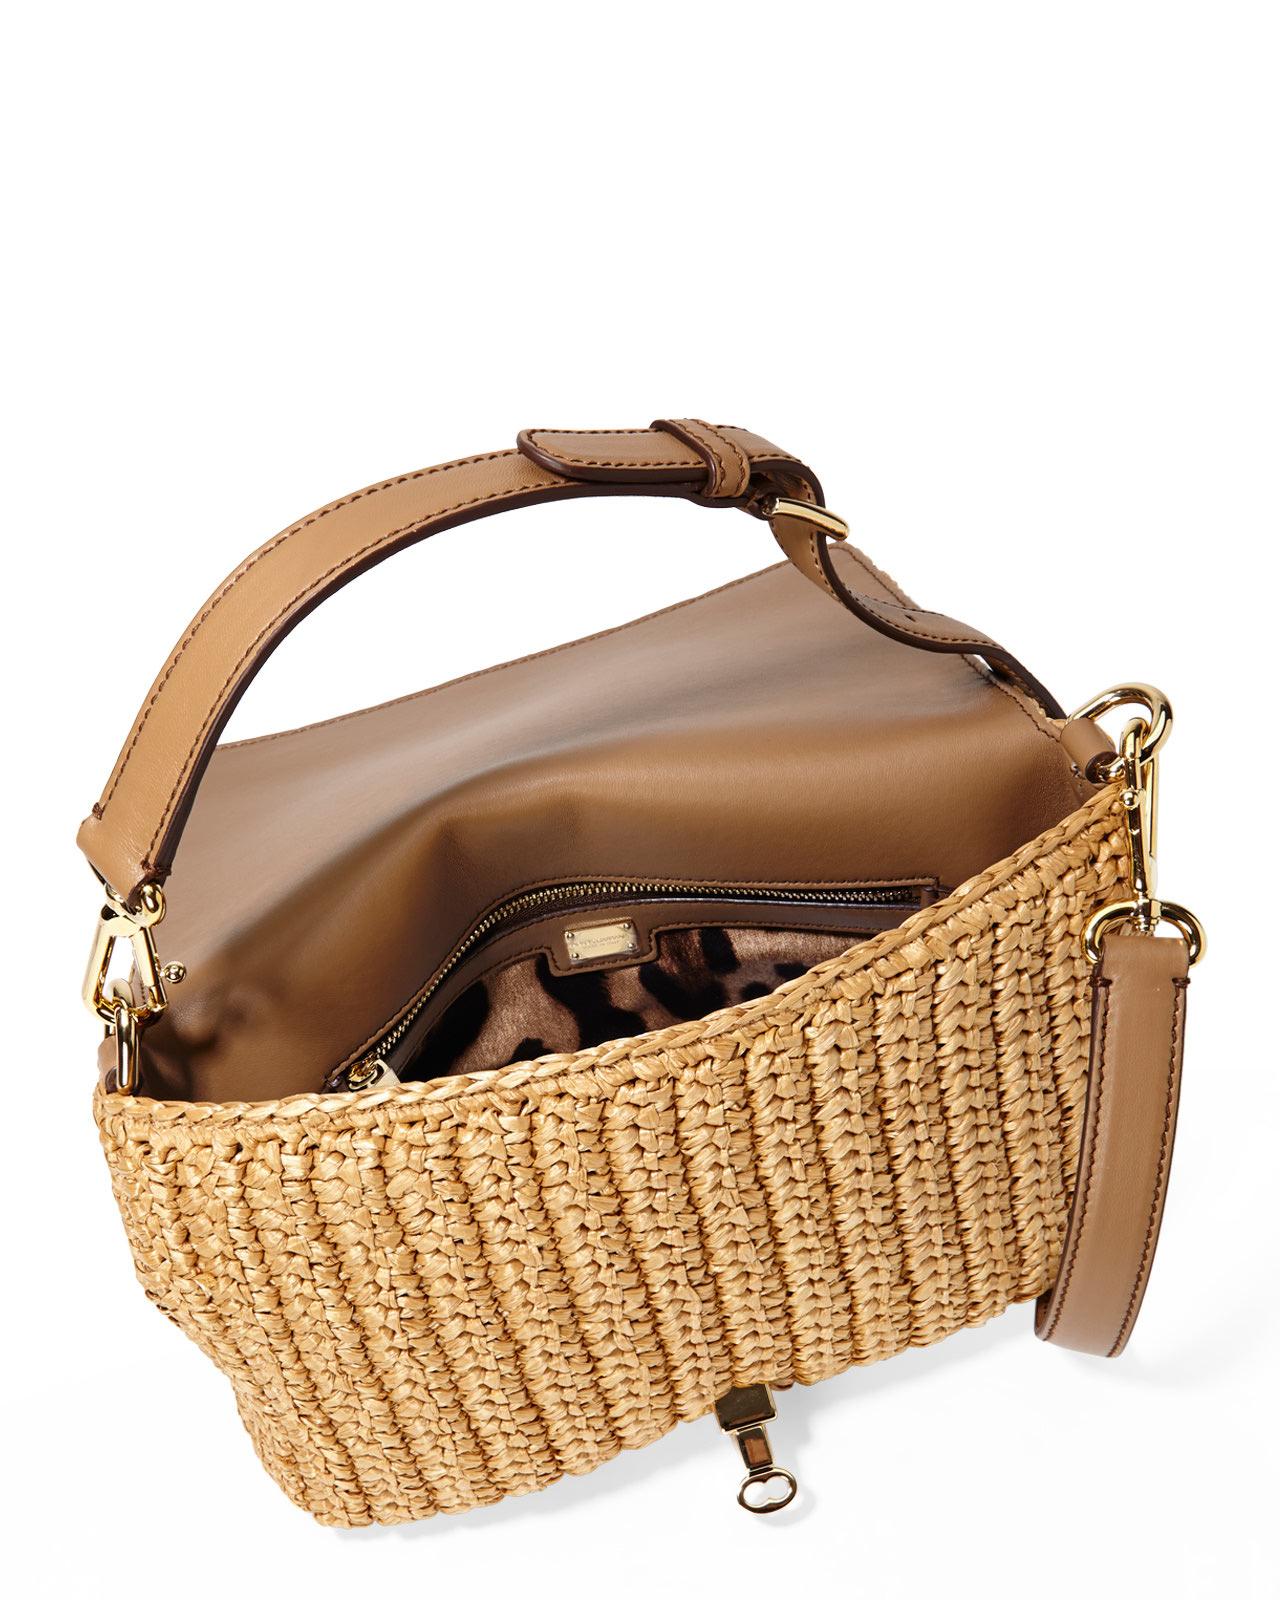 Lyst - Dolce   Gabbana Embellished Raffia Shoulder Bag in Brown 138b4dadec59a